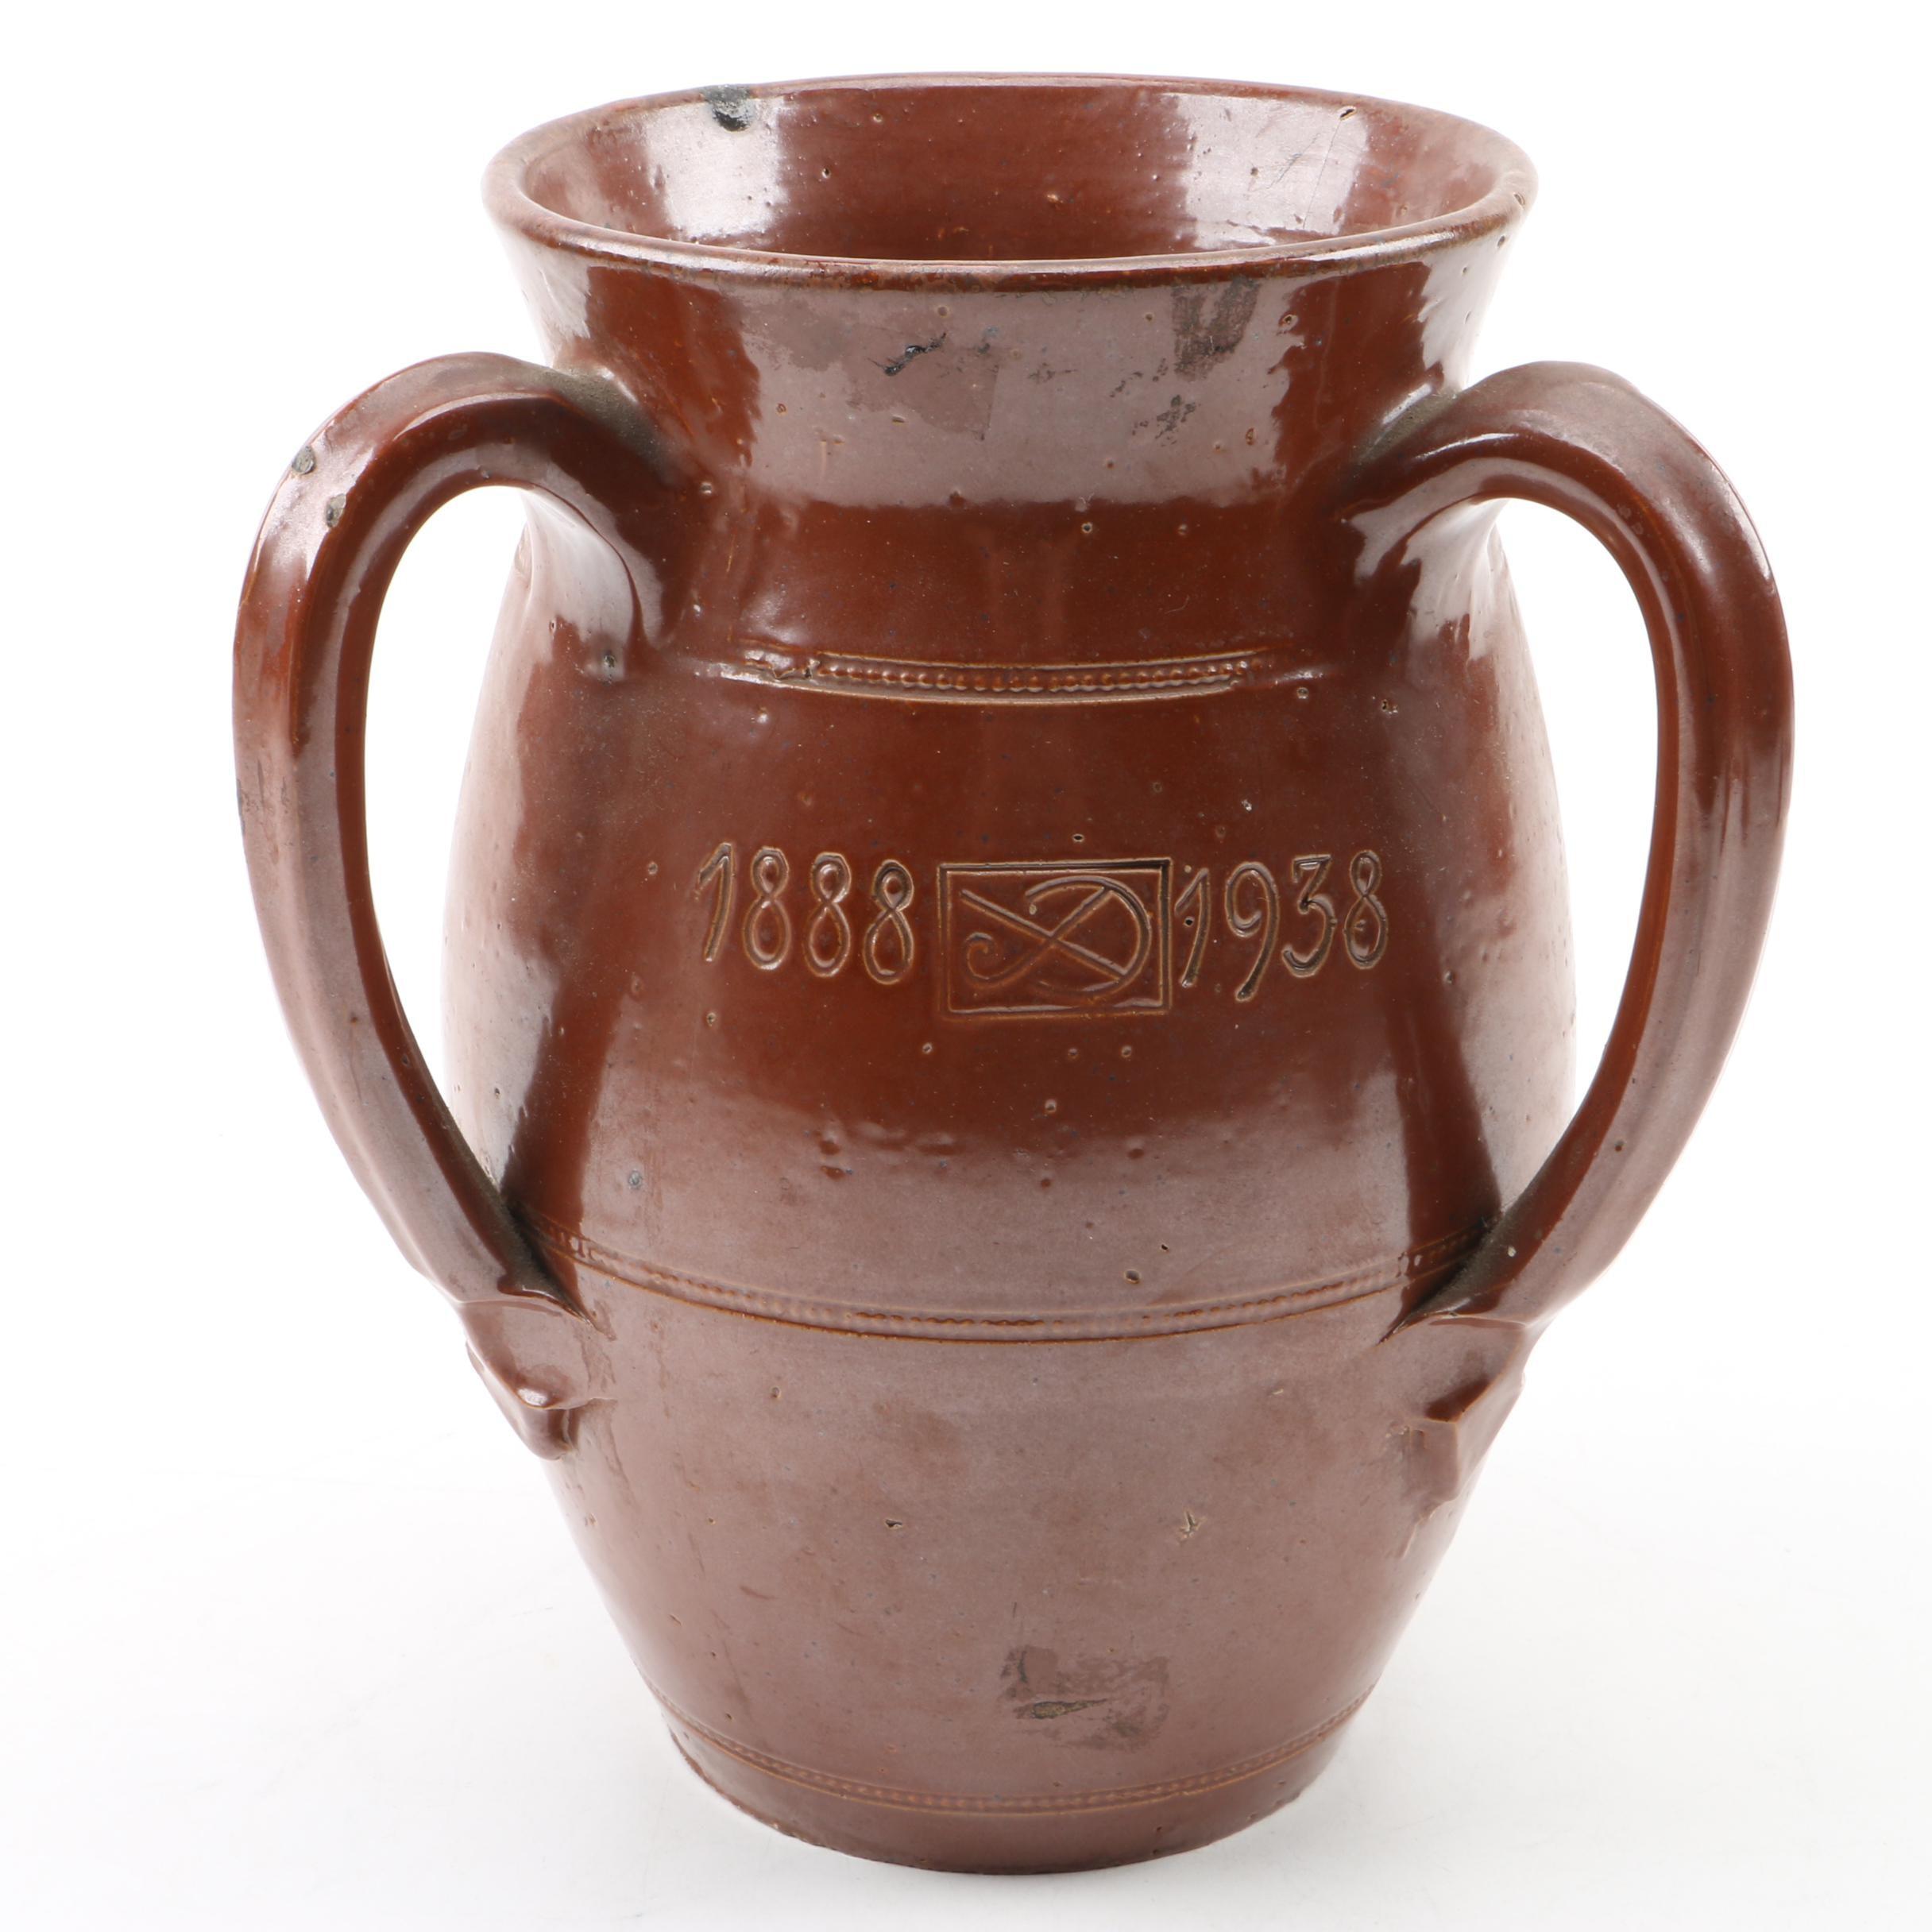 Vintage Belgian Stoneware Jubilee Stein